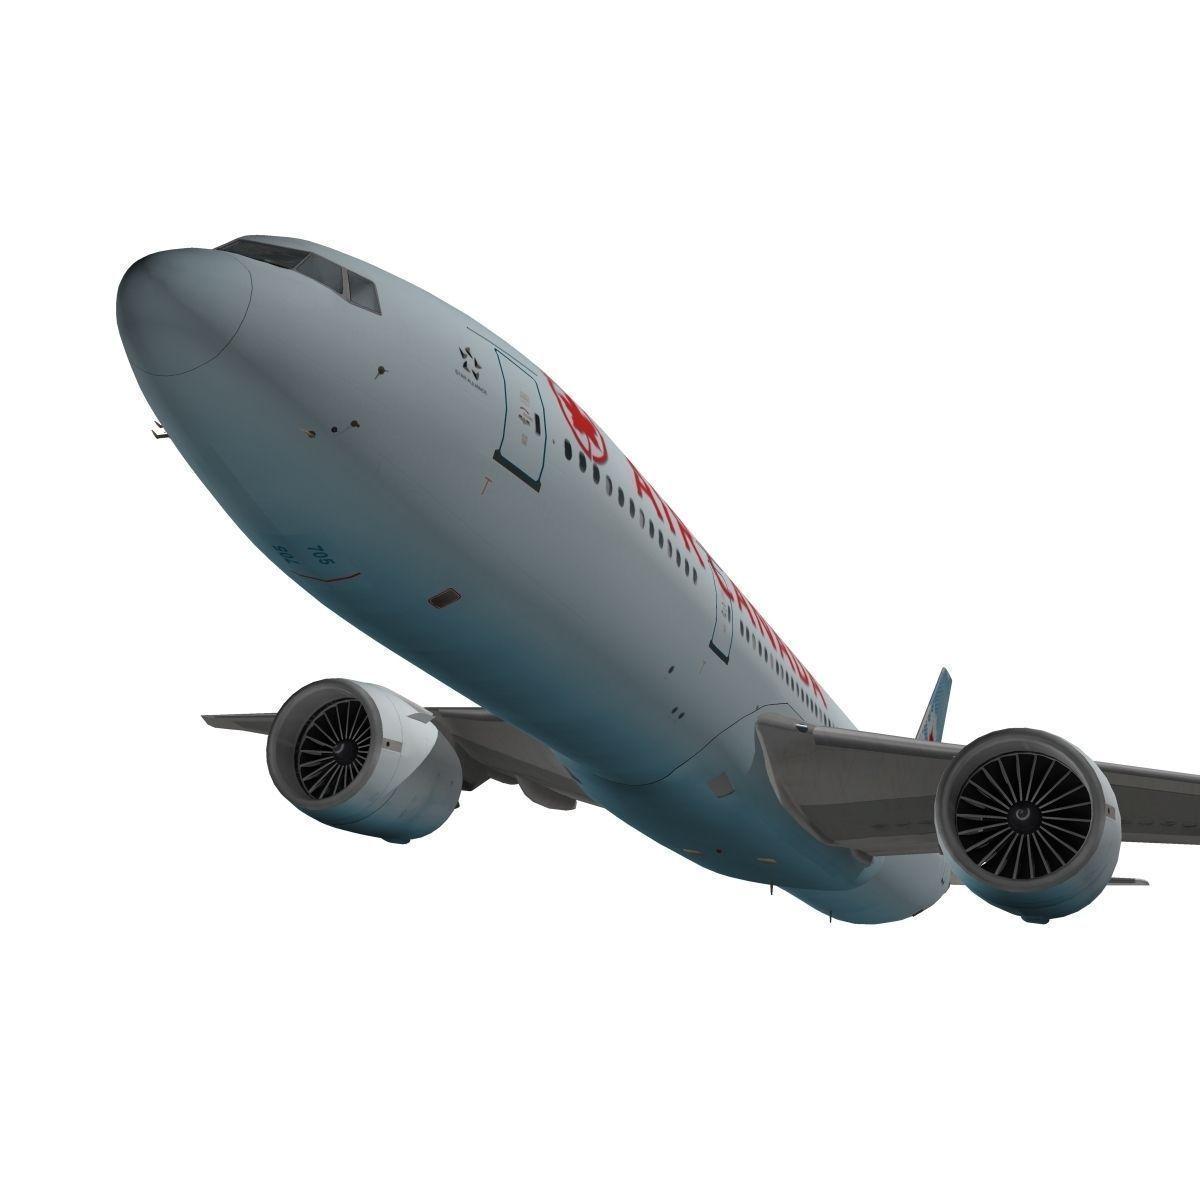 Boeing 777-200LR Air Canada